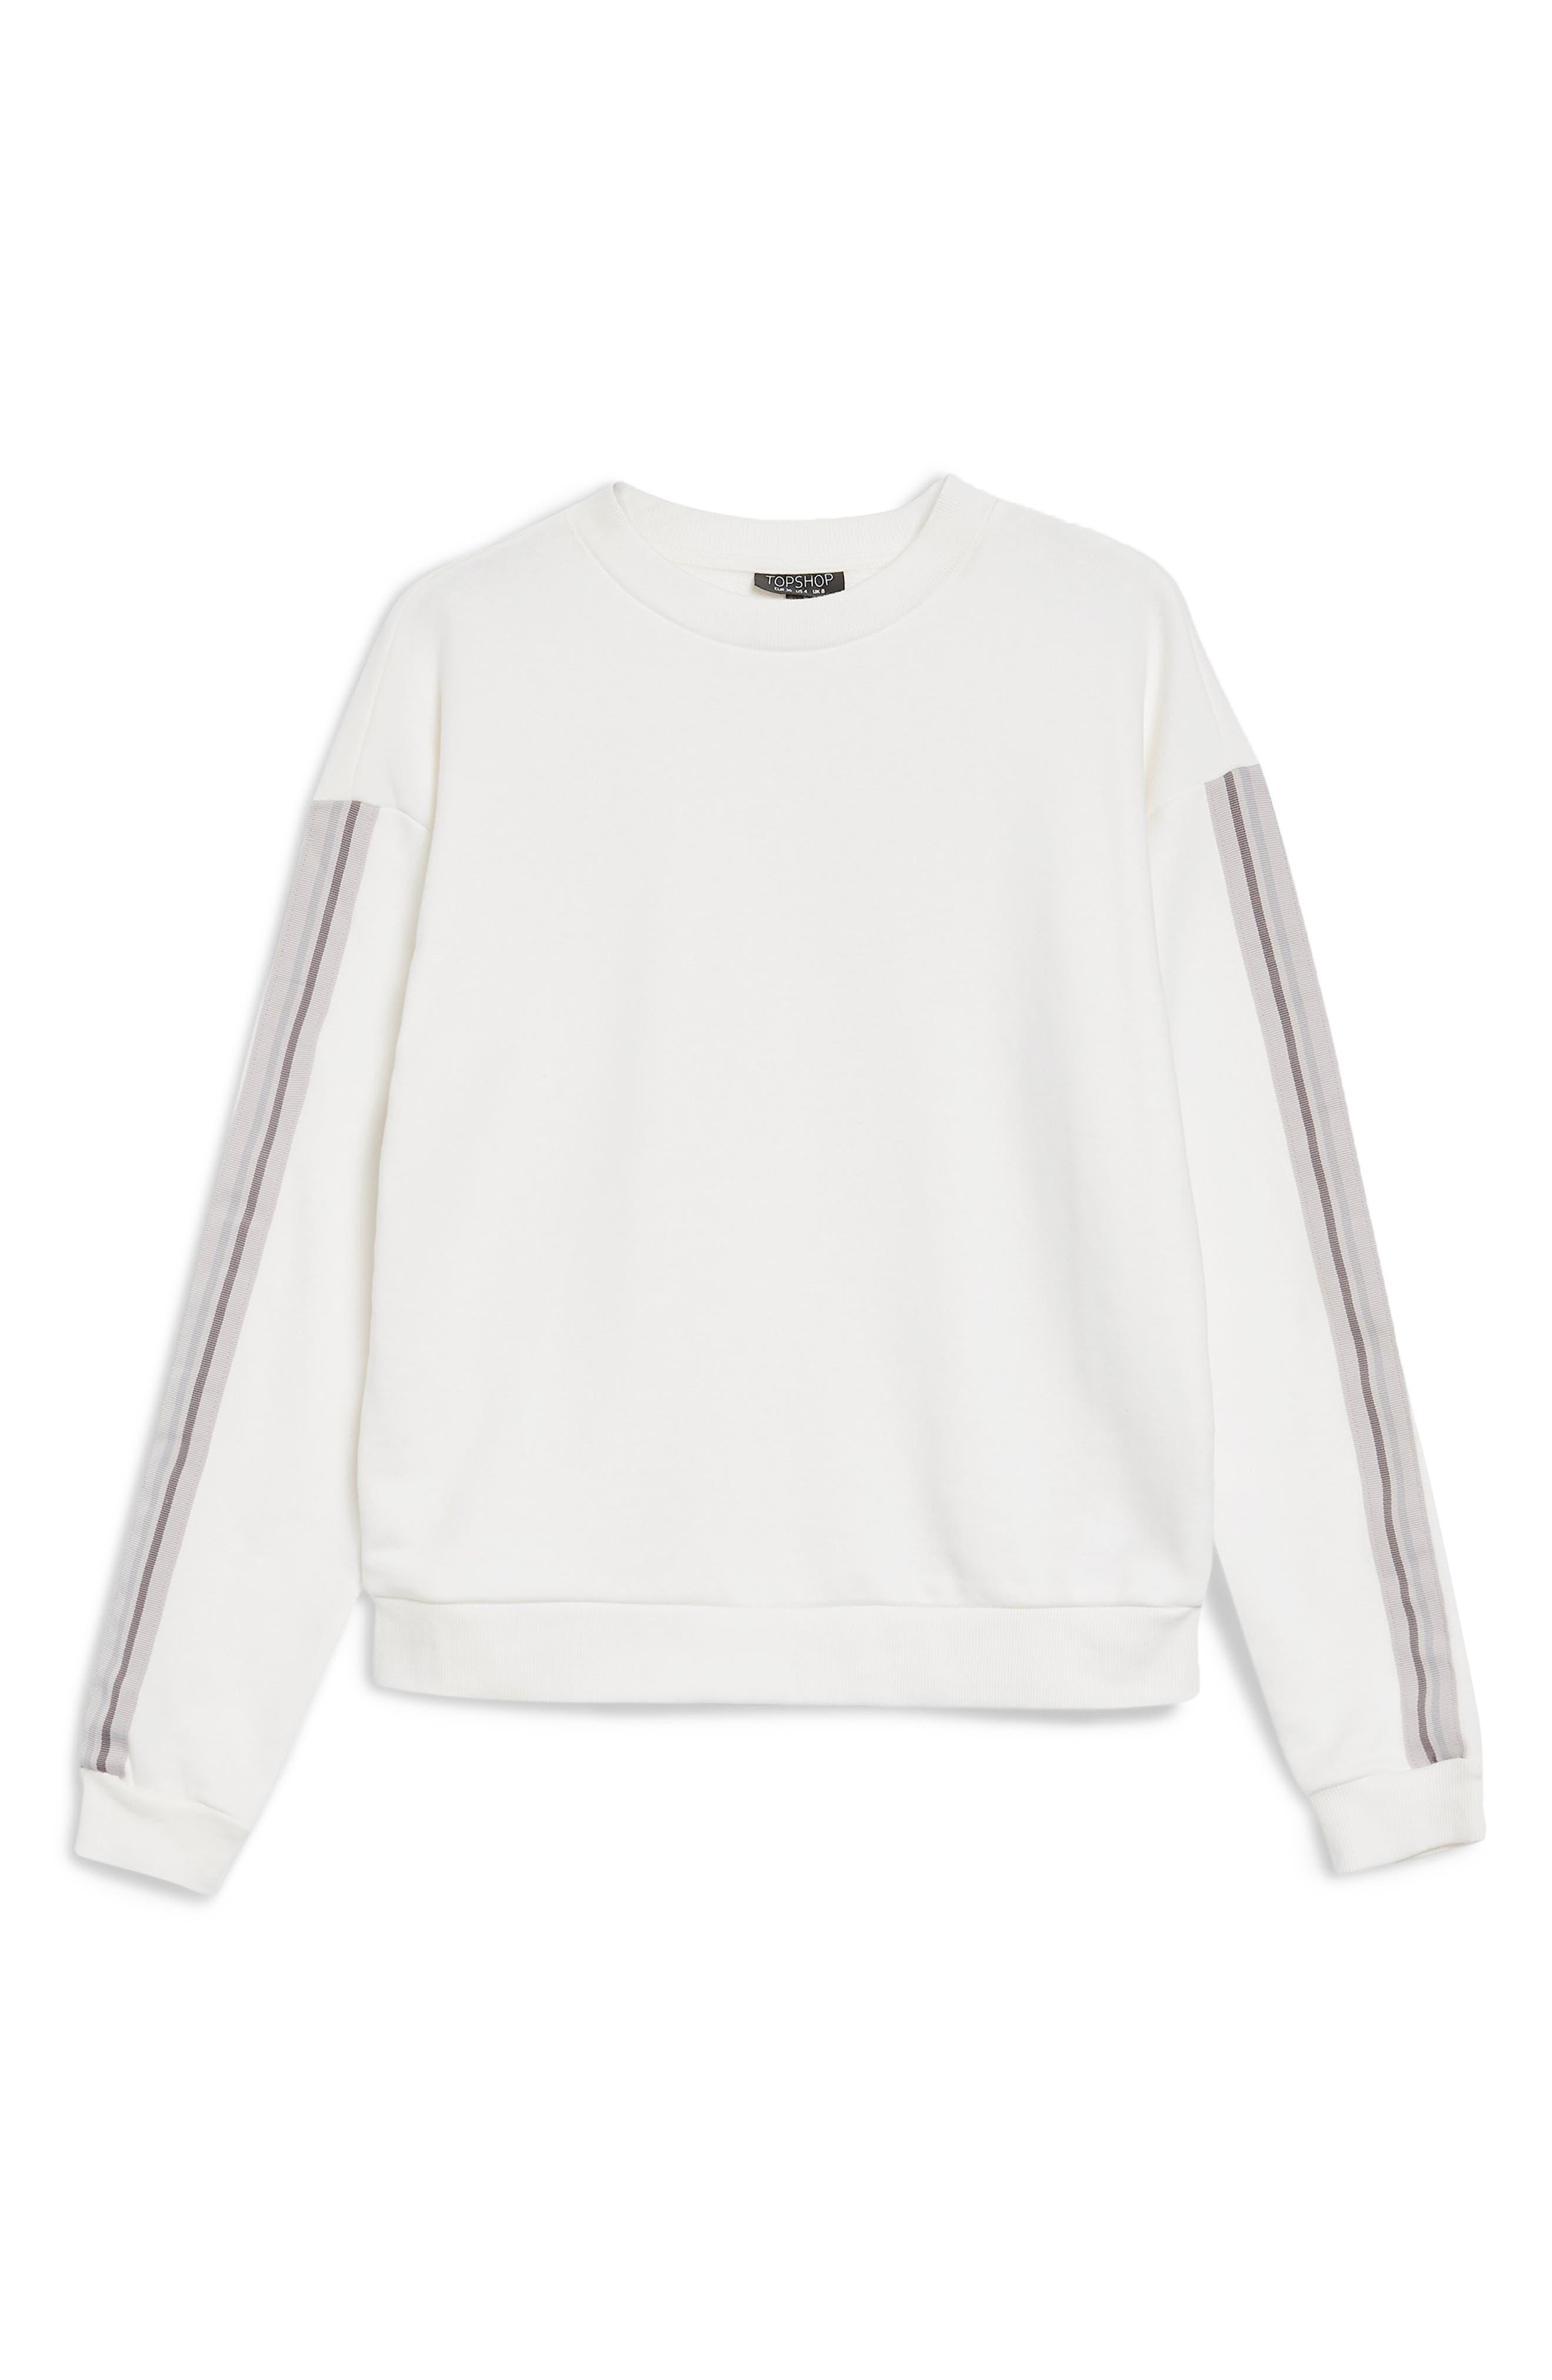 Taped Sleeve Sweatshirt,                             Alternate thumbnail 3, color,                             100